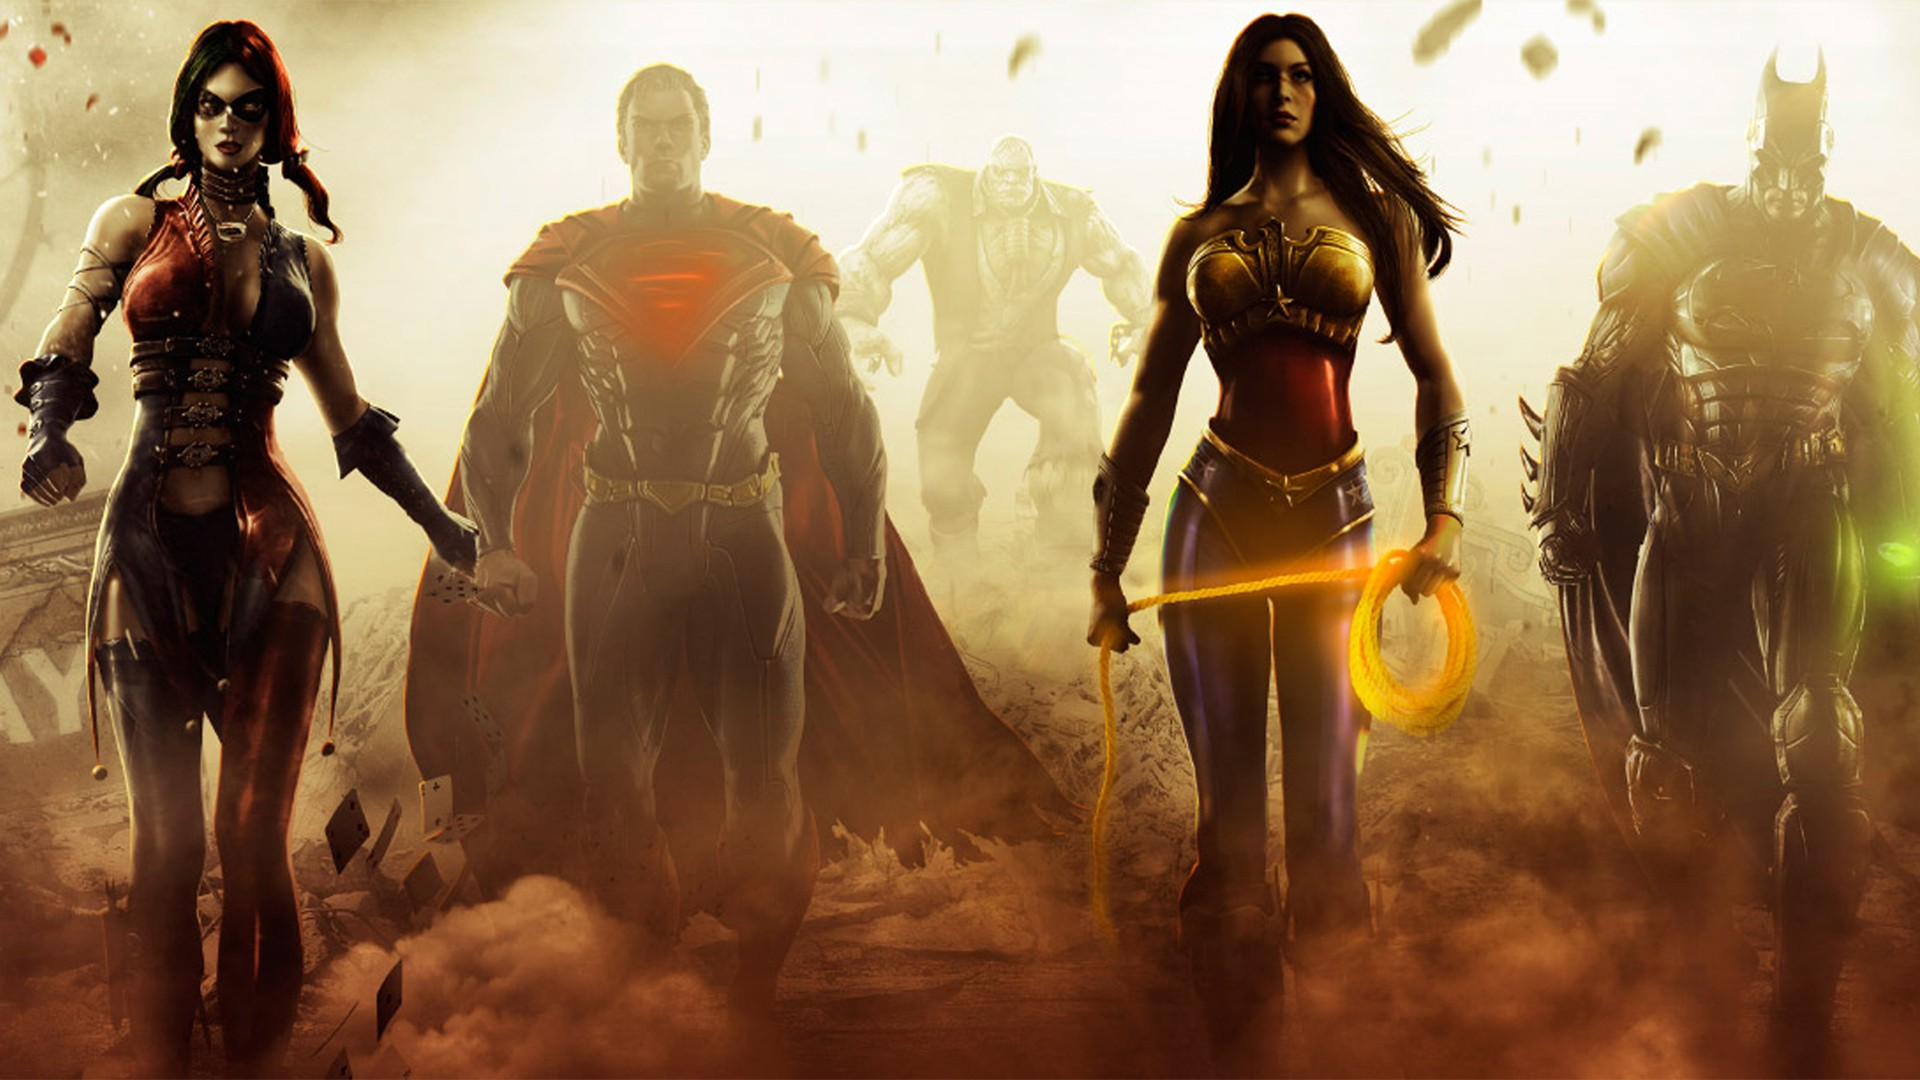 Superman Harley Quinn Wonder Woman New 52 Solomon Grundy Suicide Squad 1920x1080